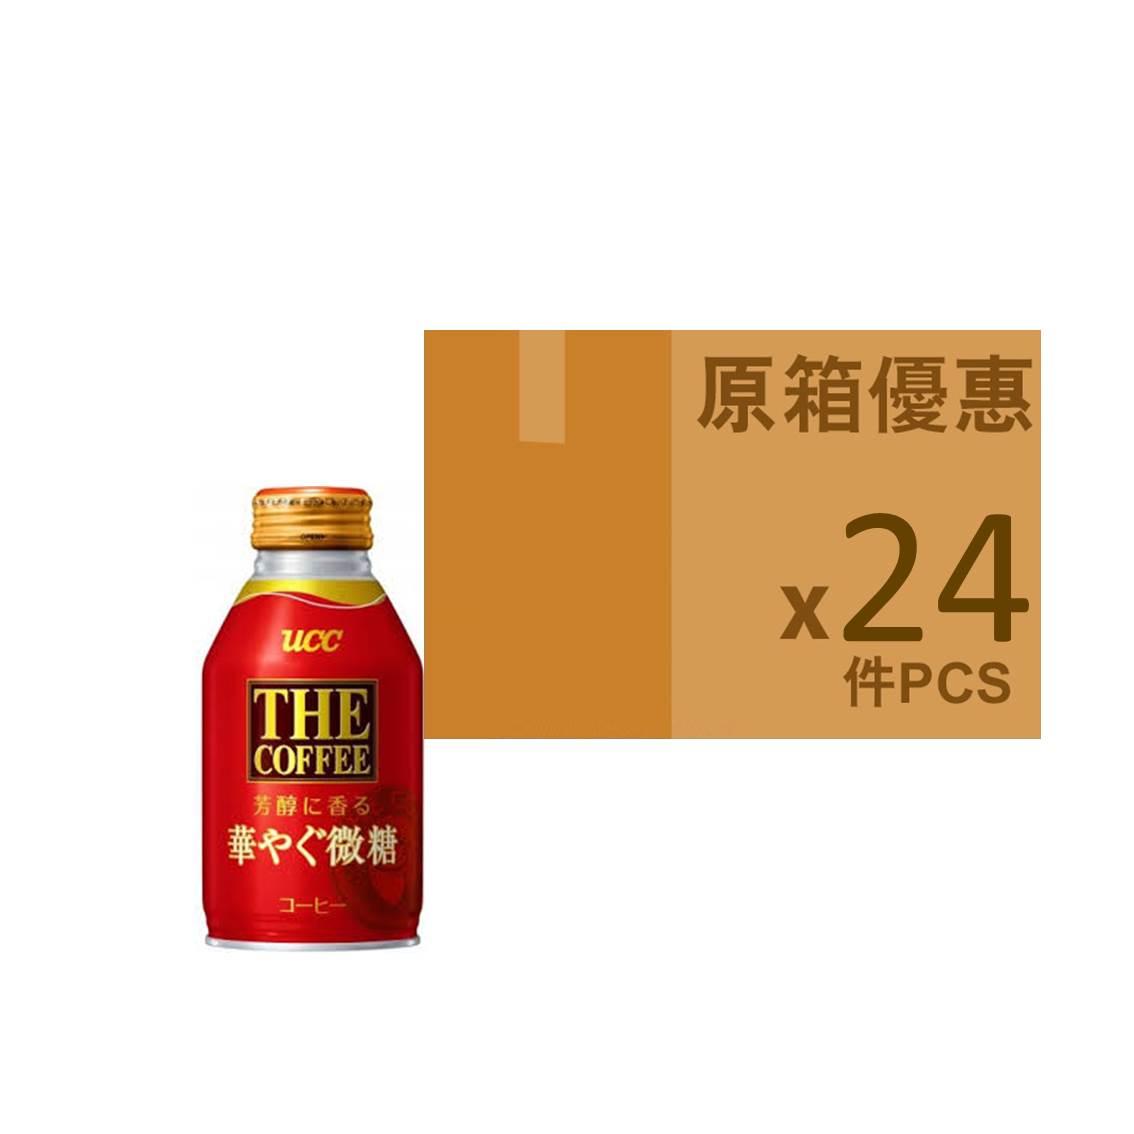 UCC芳醇微糖咖啡 260G (原箱)